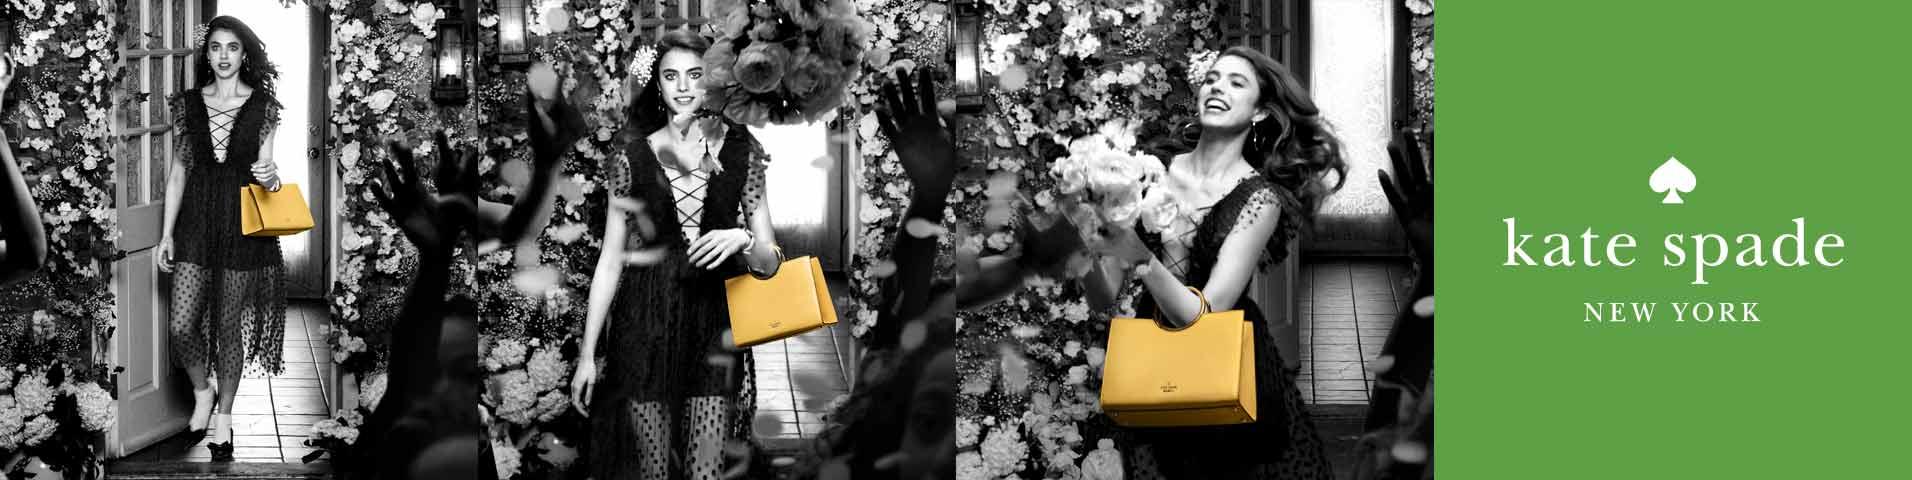 Kate spade new york Damenmode und -schuhe online shoppen | Zalando